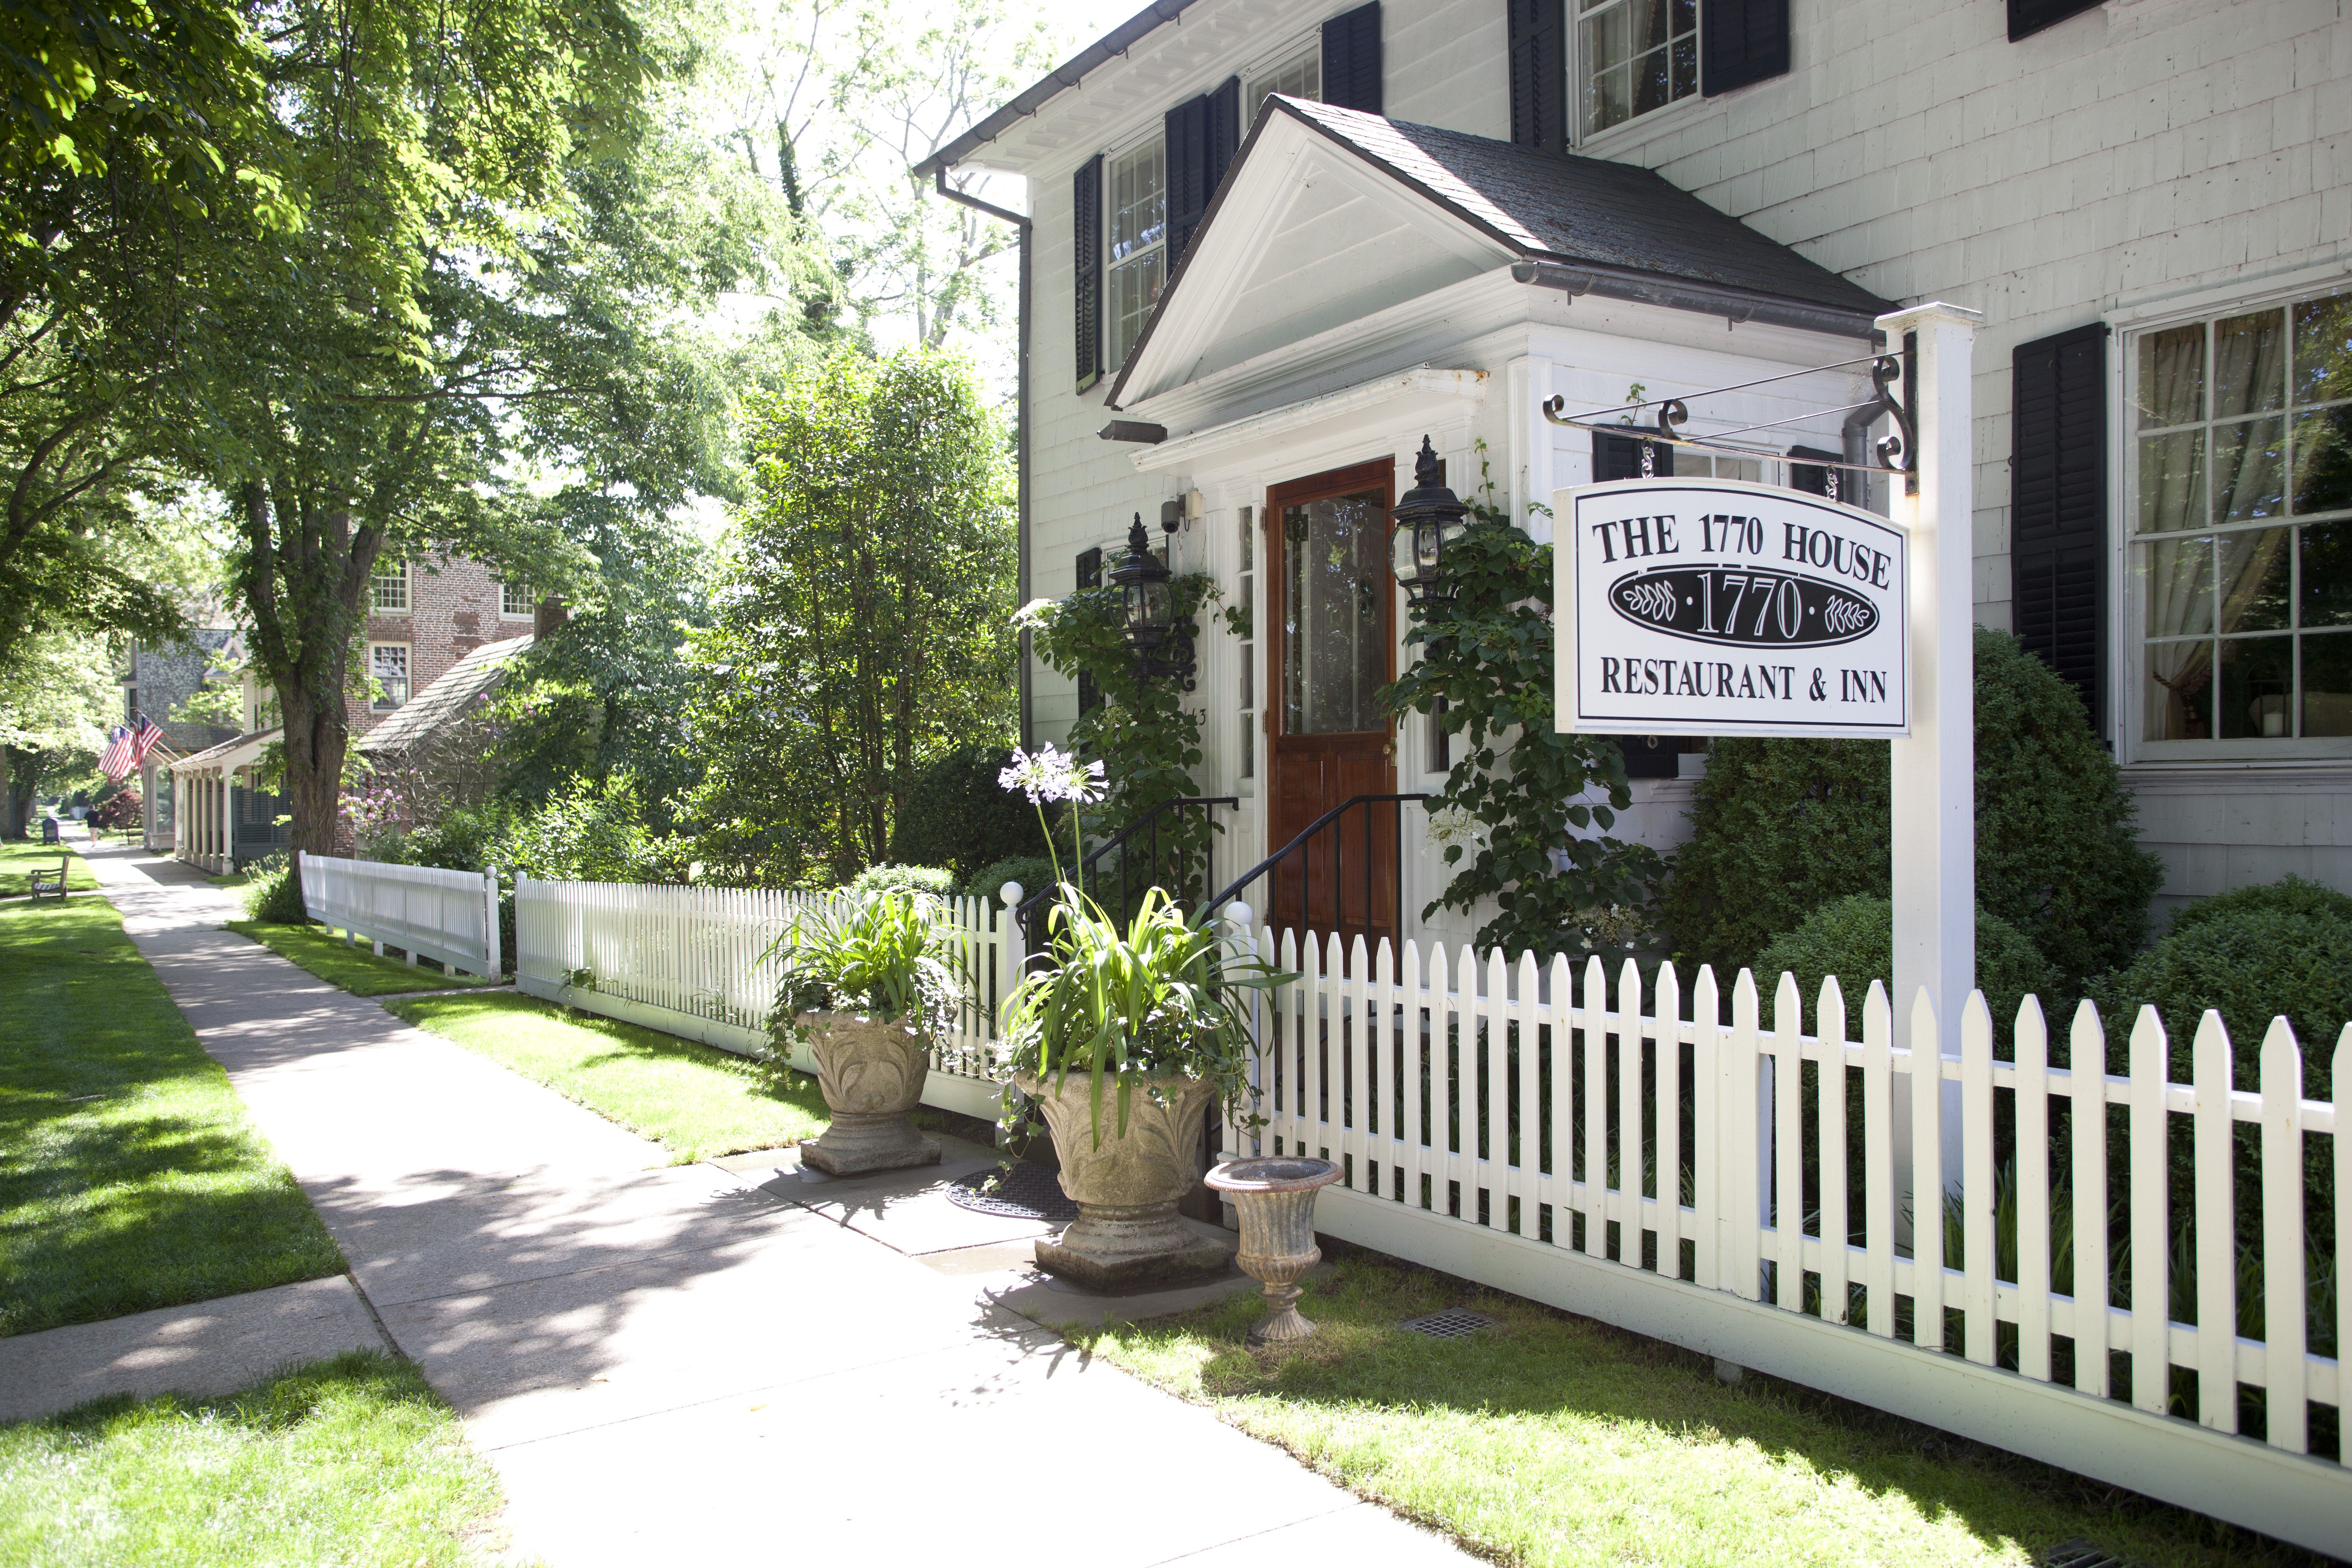 Ina Garten East Hampton Home 1770 house has a wonderful restaurant; i love their meatloaf